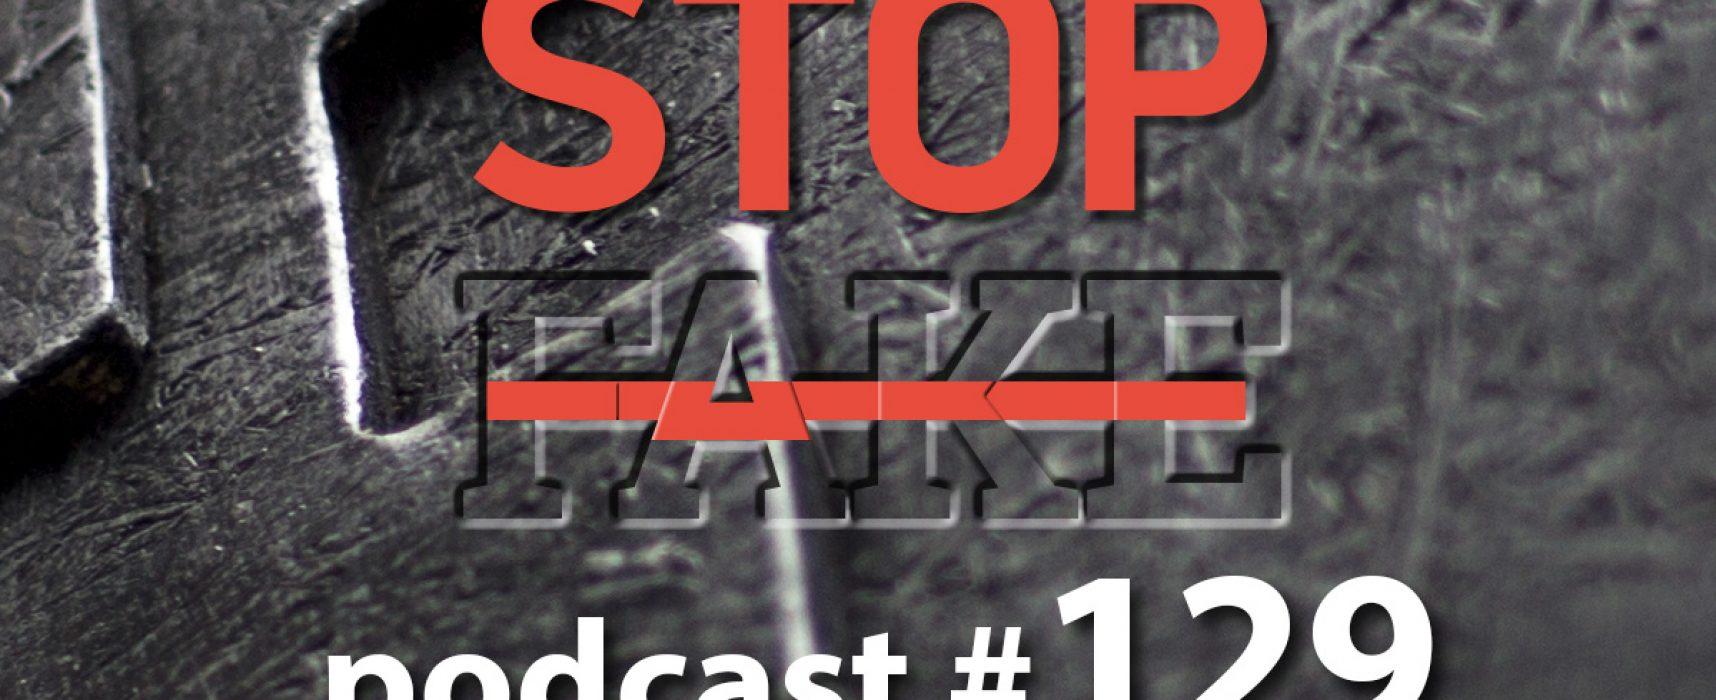 StopFake podcast #129